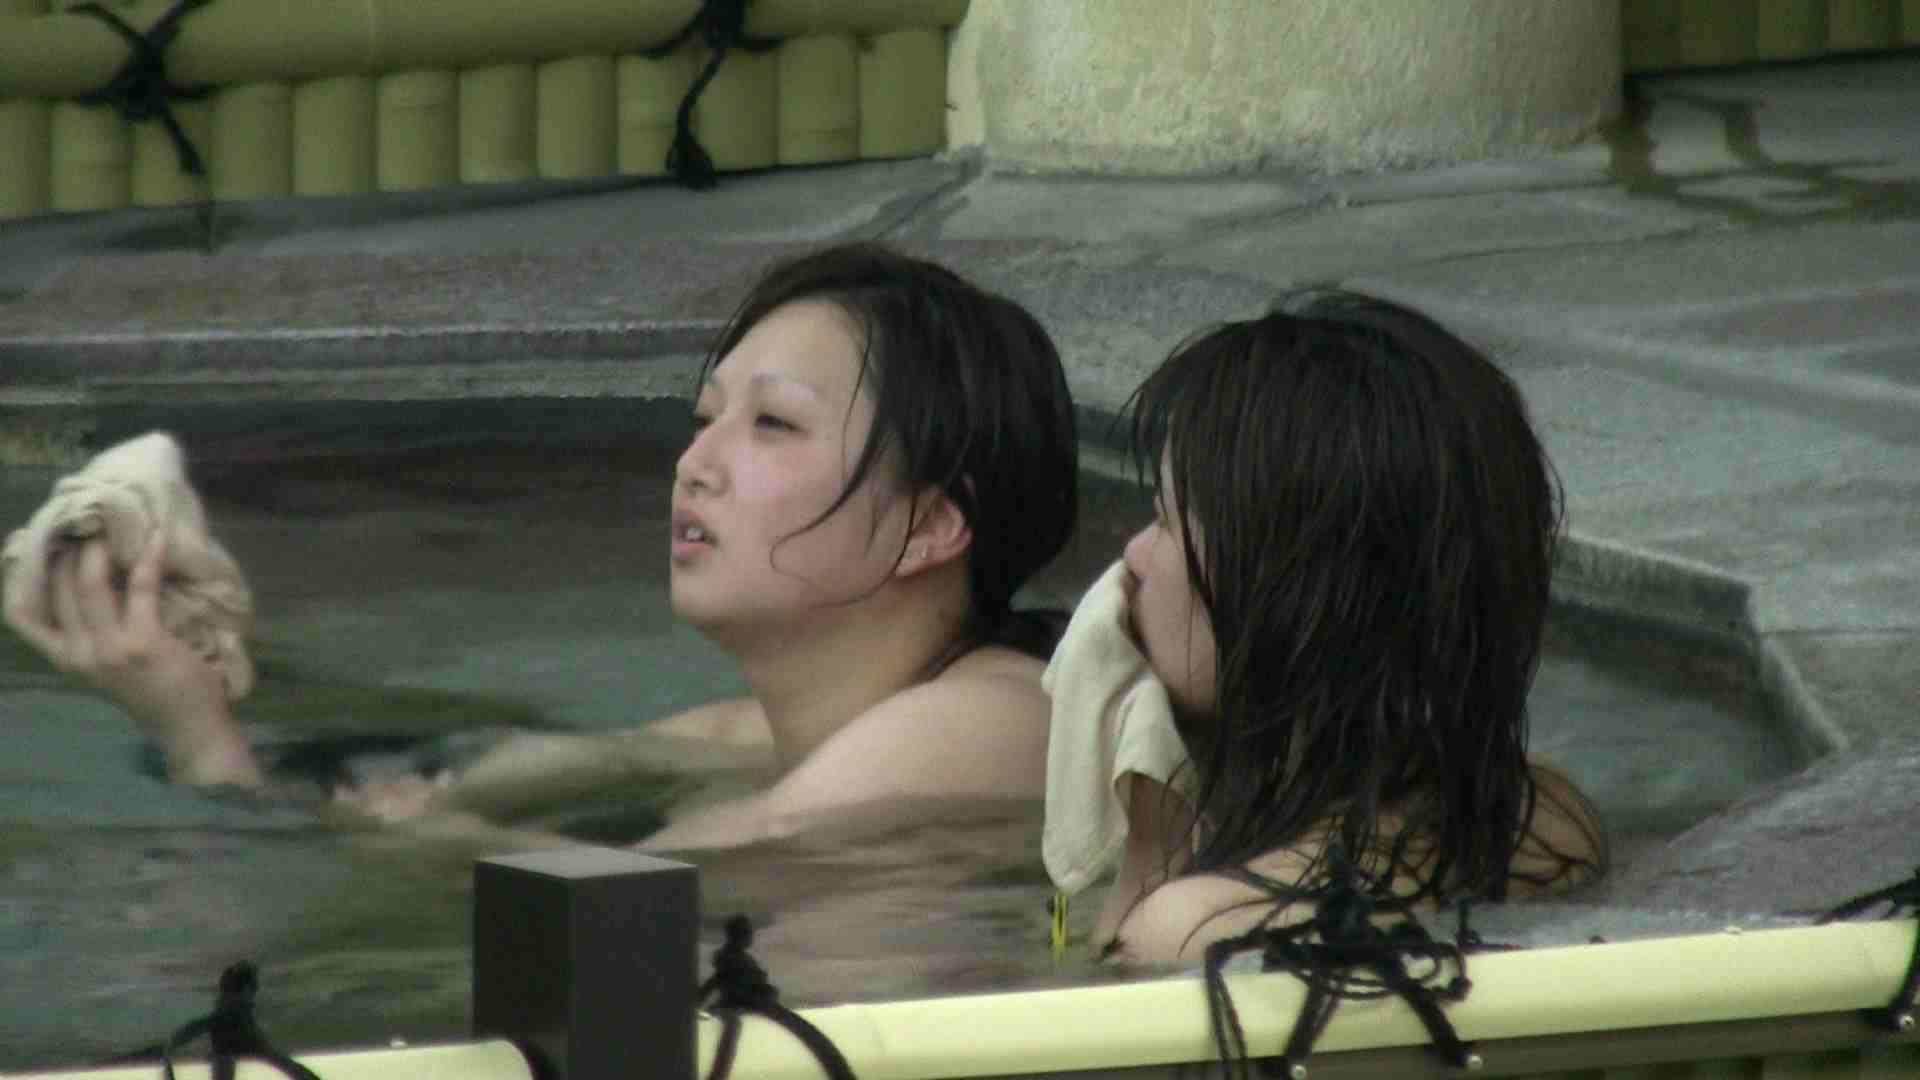 Aquaな露天風呂Vol.184 OLセックス  81画像 3